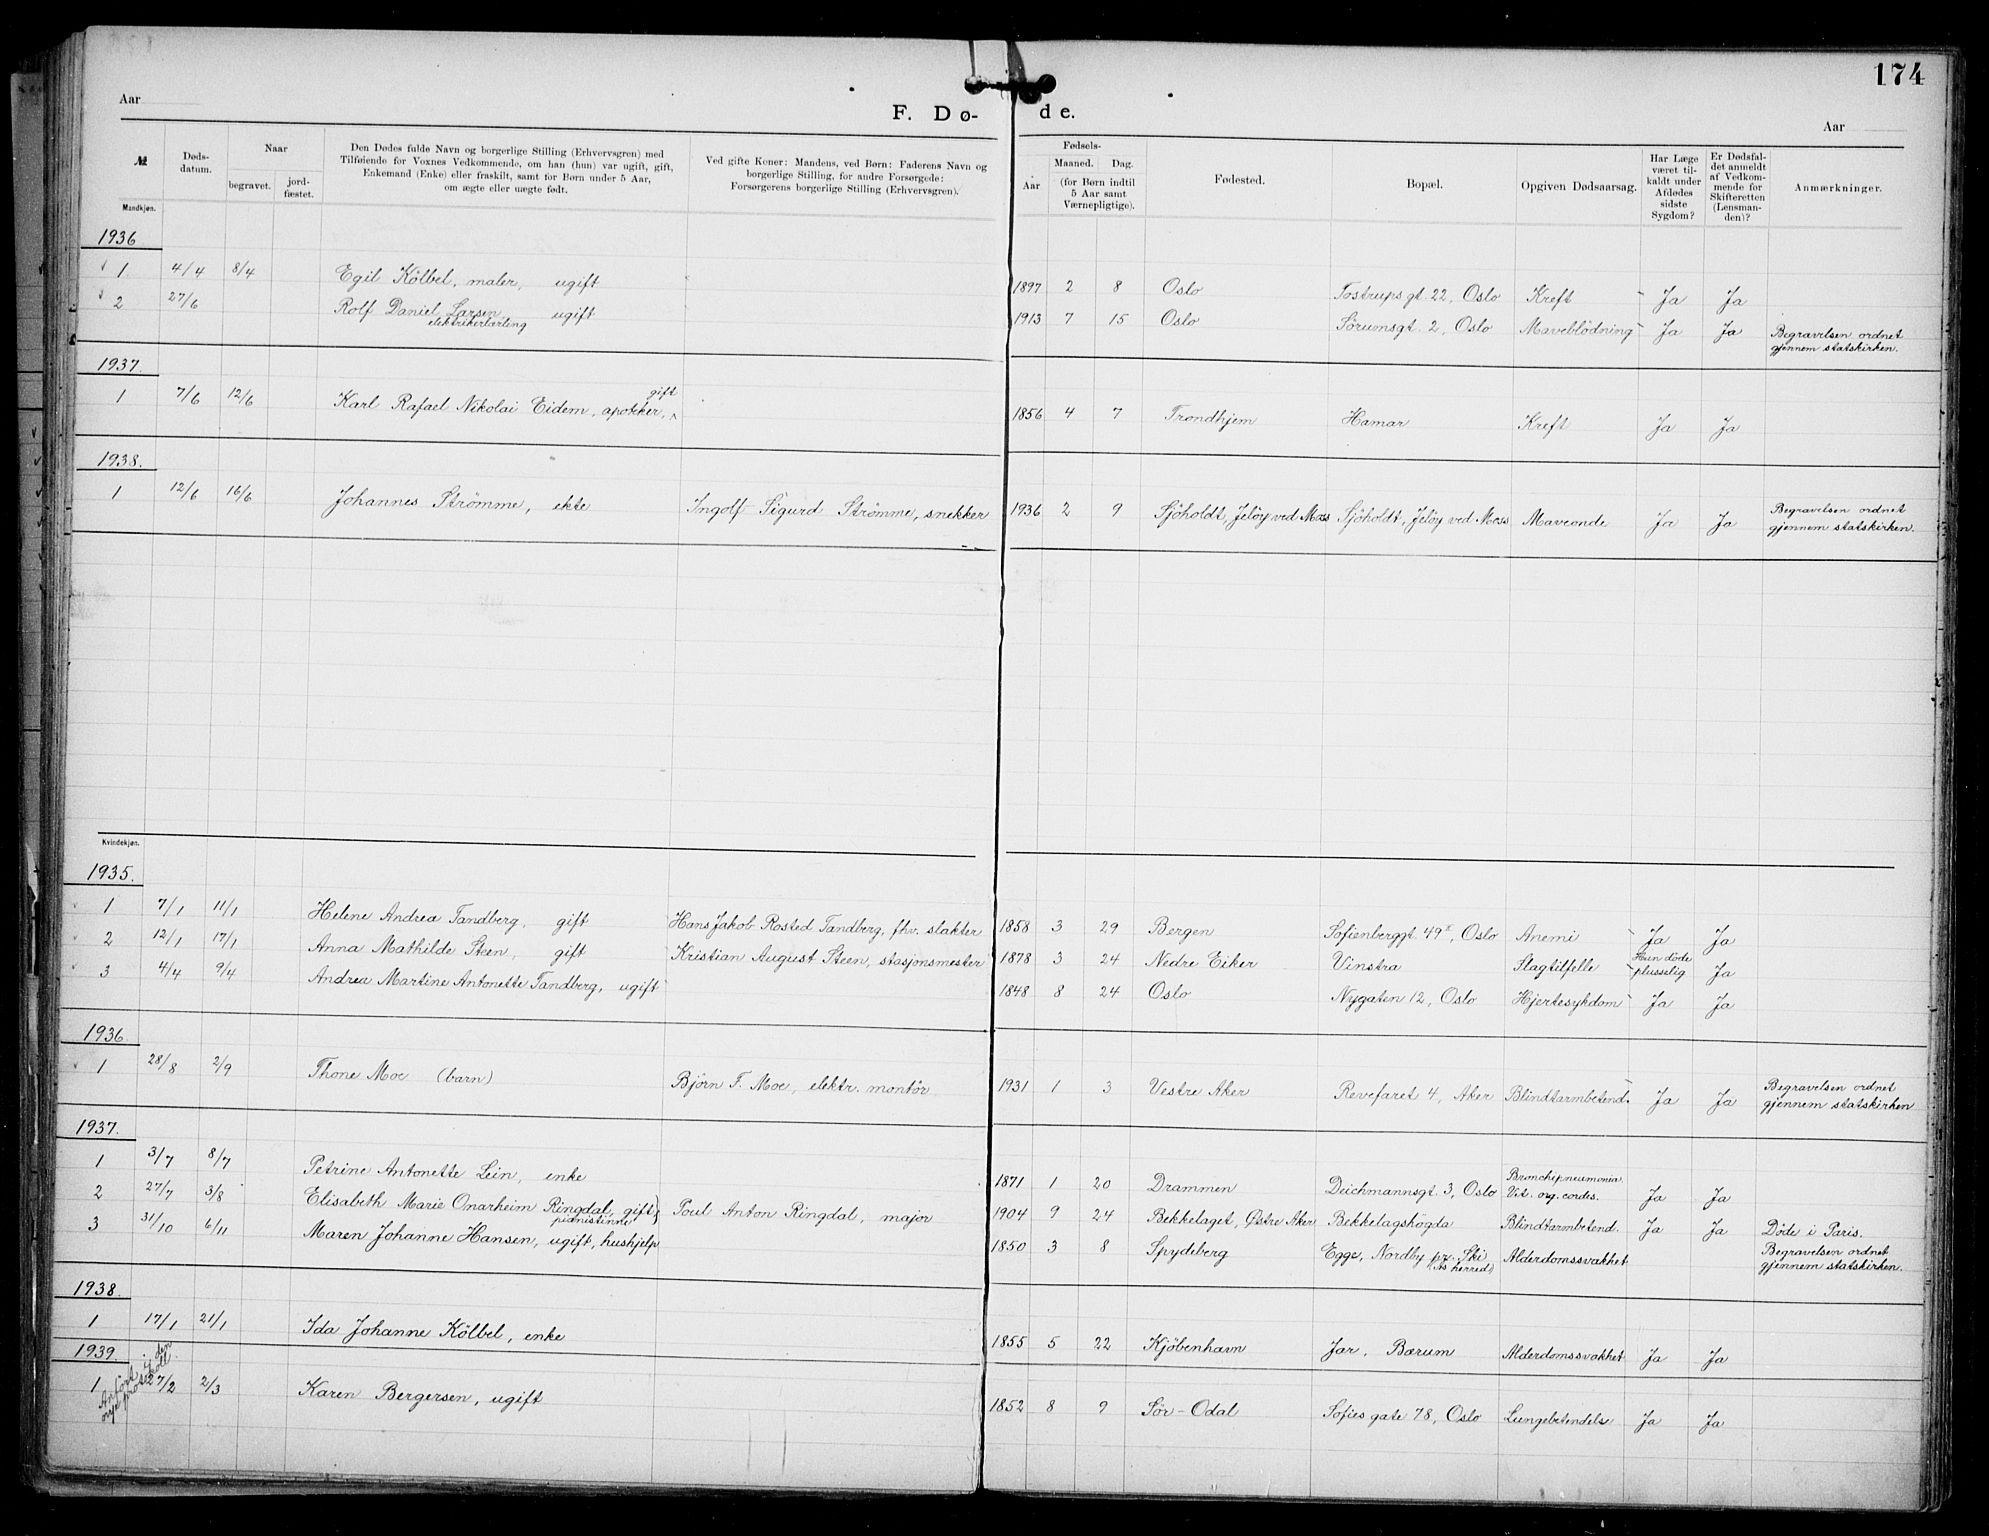 SAO, Den katolsk apostoliske menighet i Oslo , F/Fa/L0002: Dissenterprotokoll nr. 2, 1892-1937, s. 174